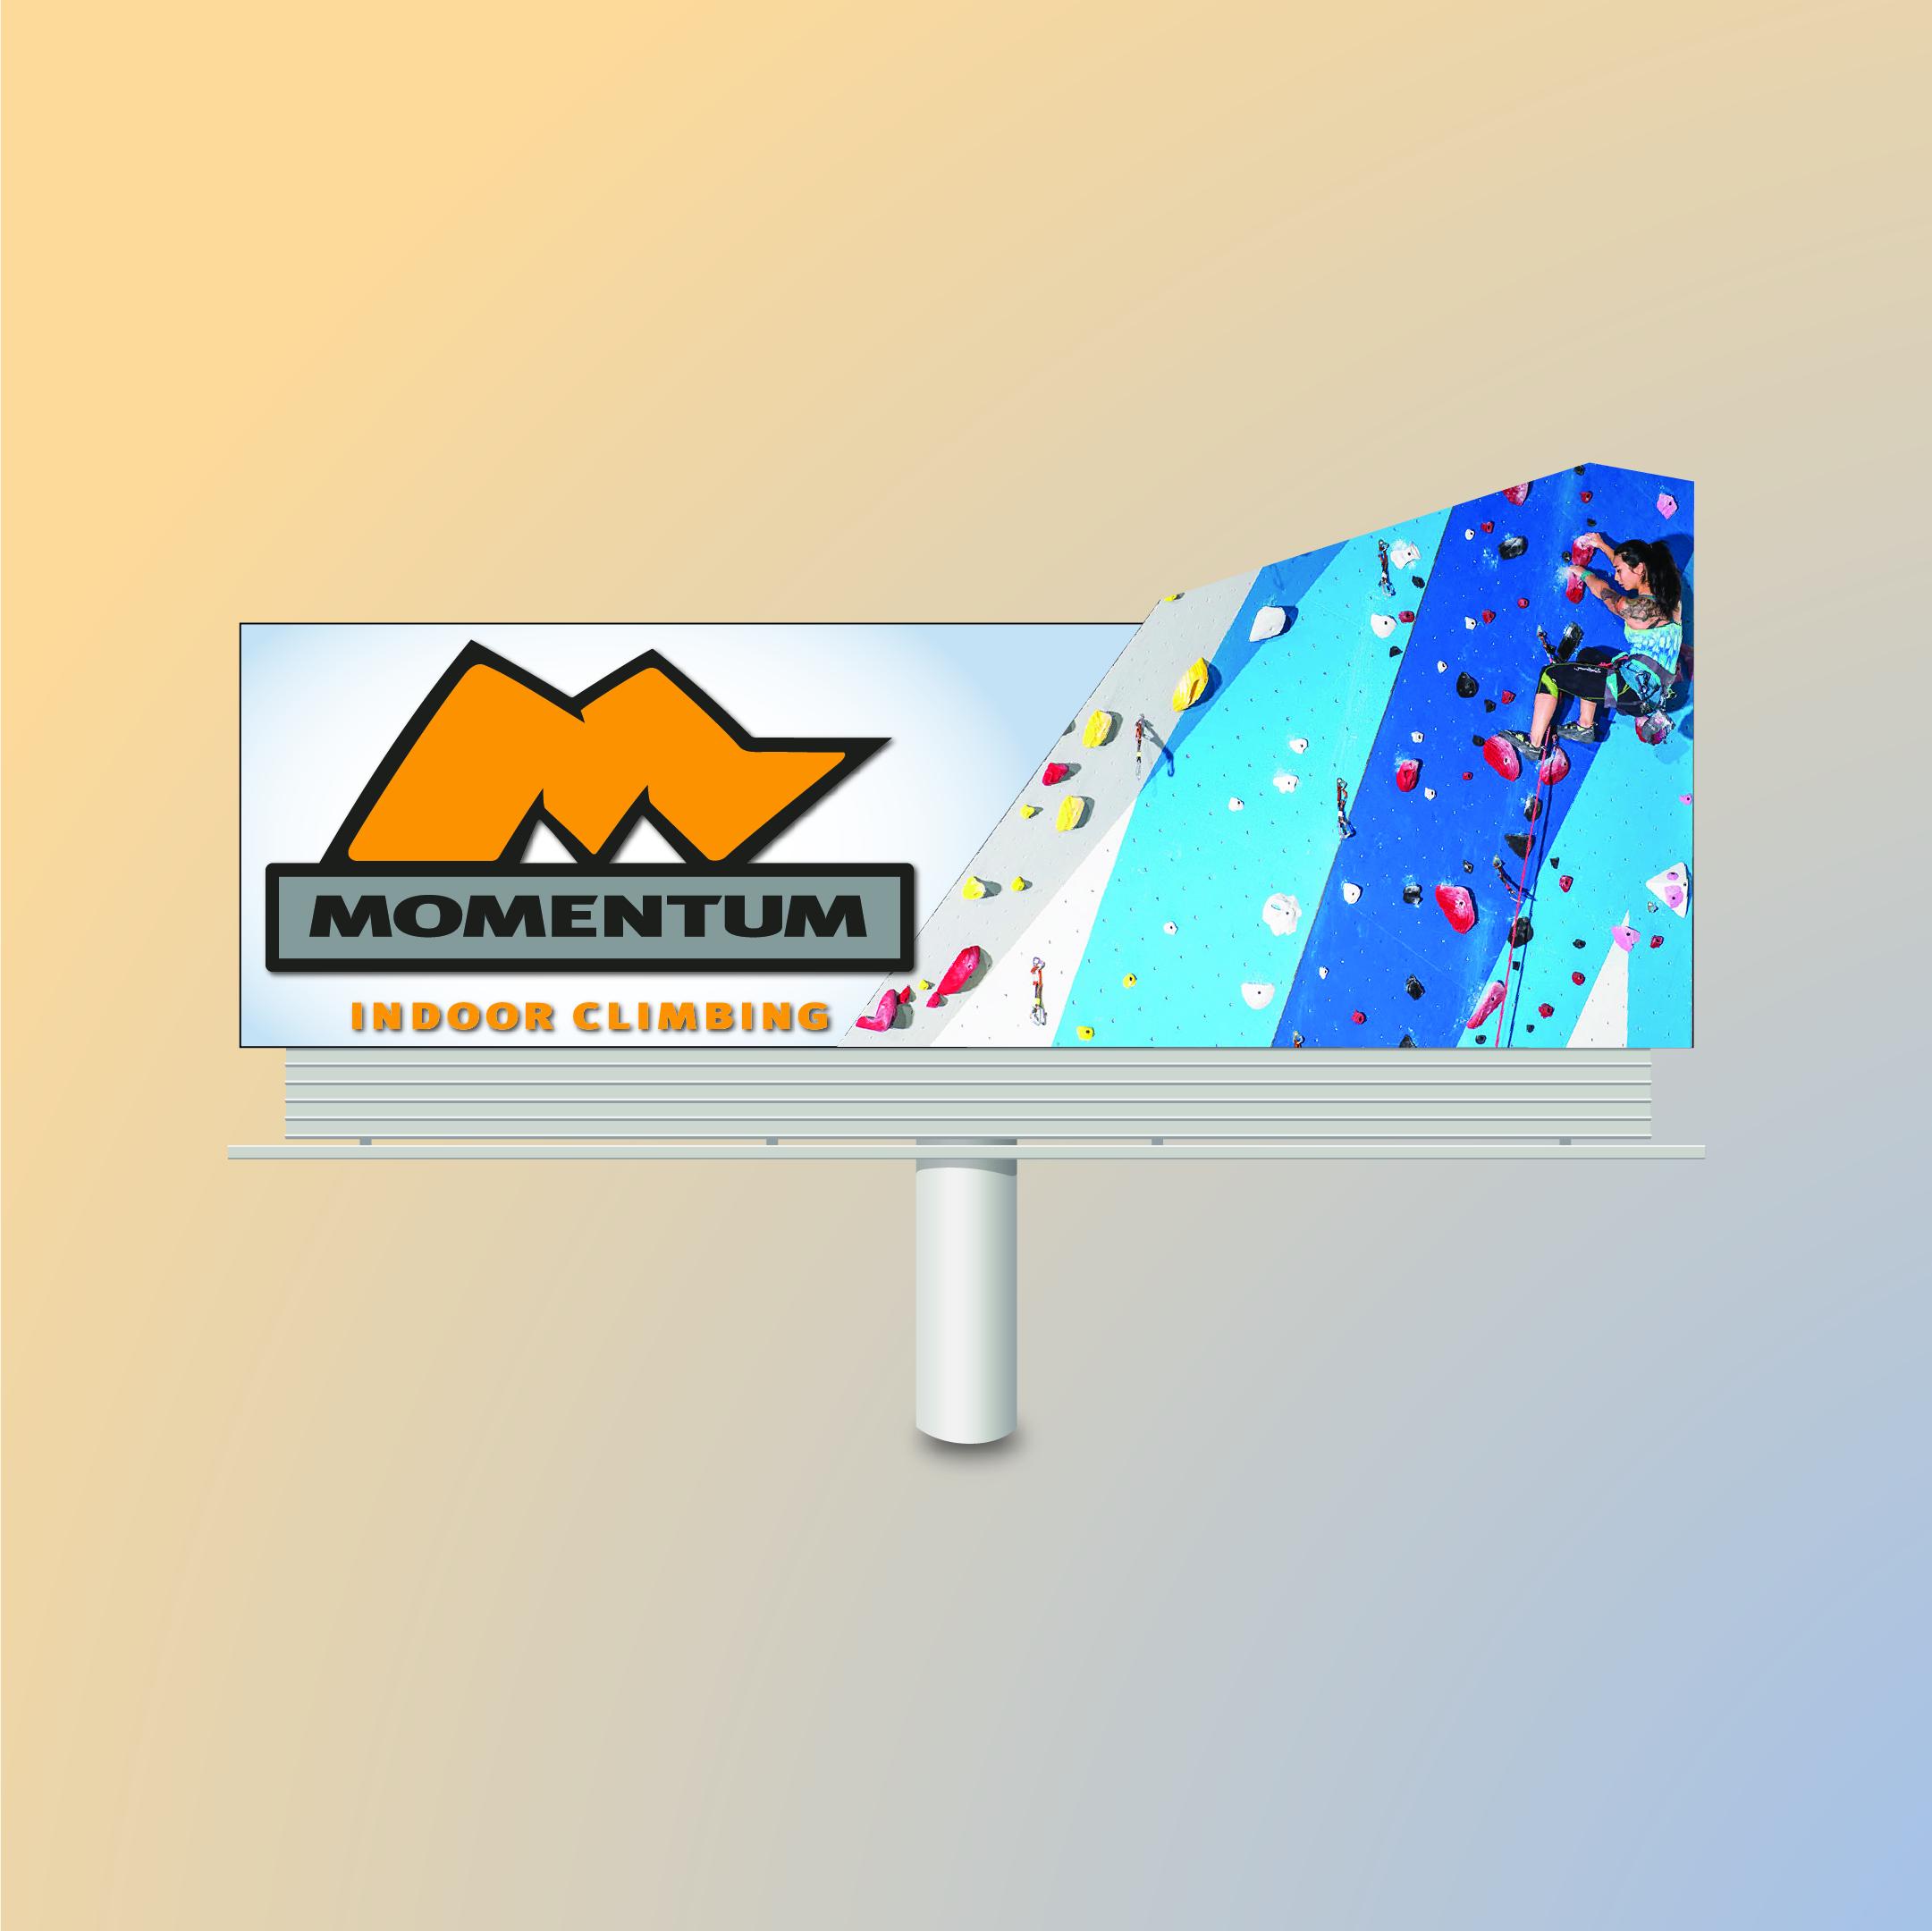 Momentum Billboard Concepts